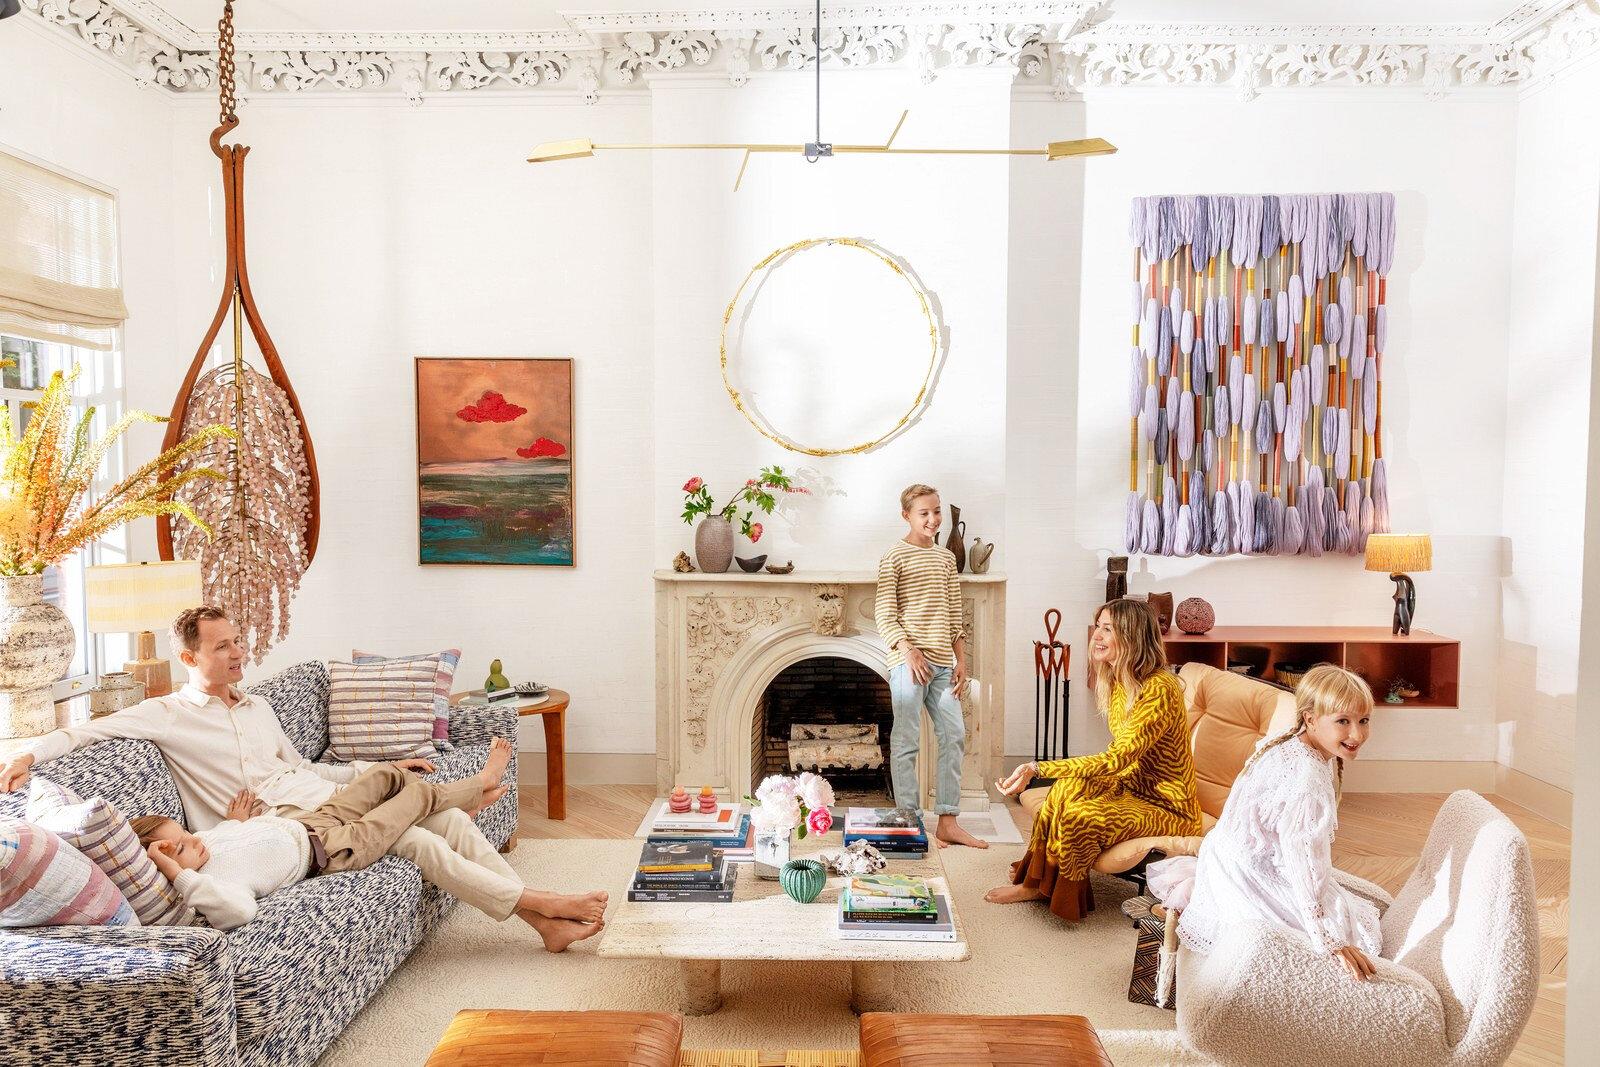 ad uj living room with fam 2.jpg